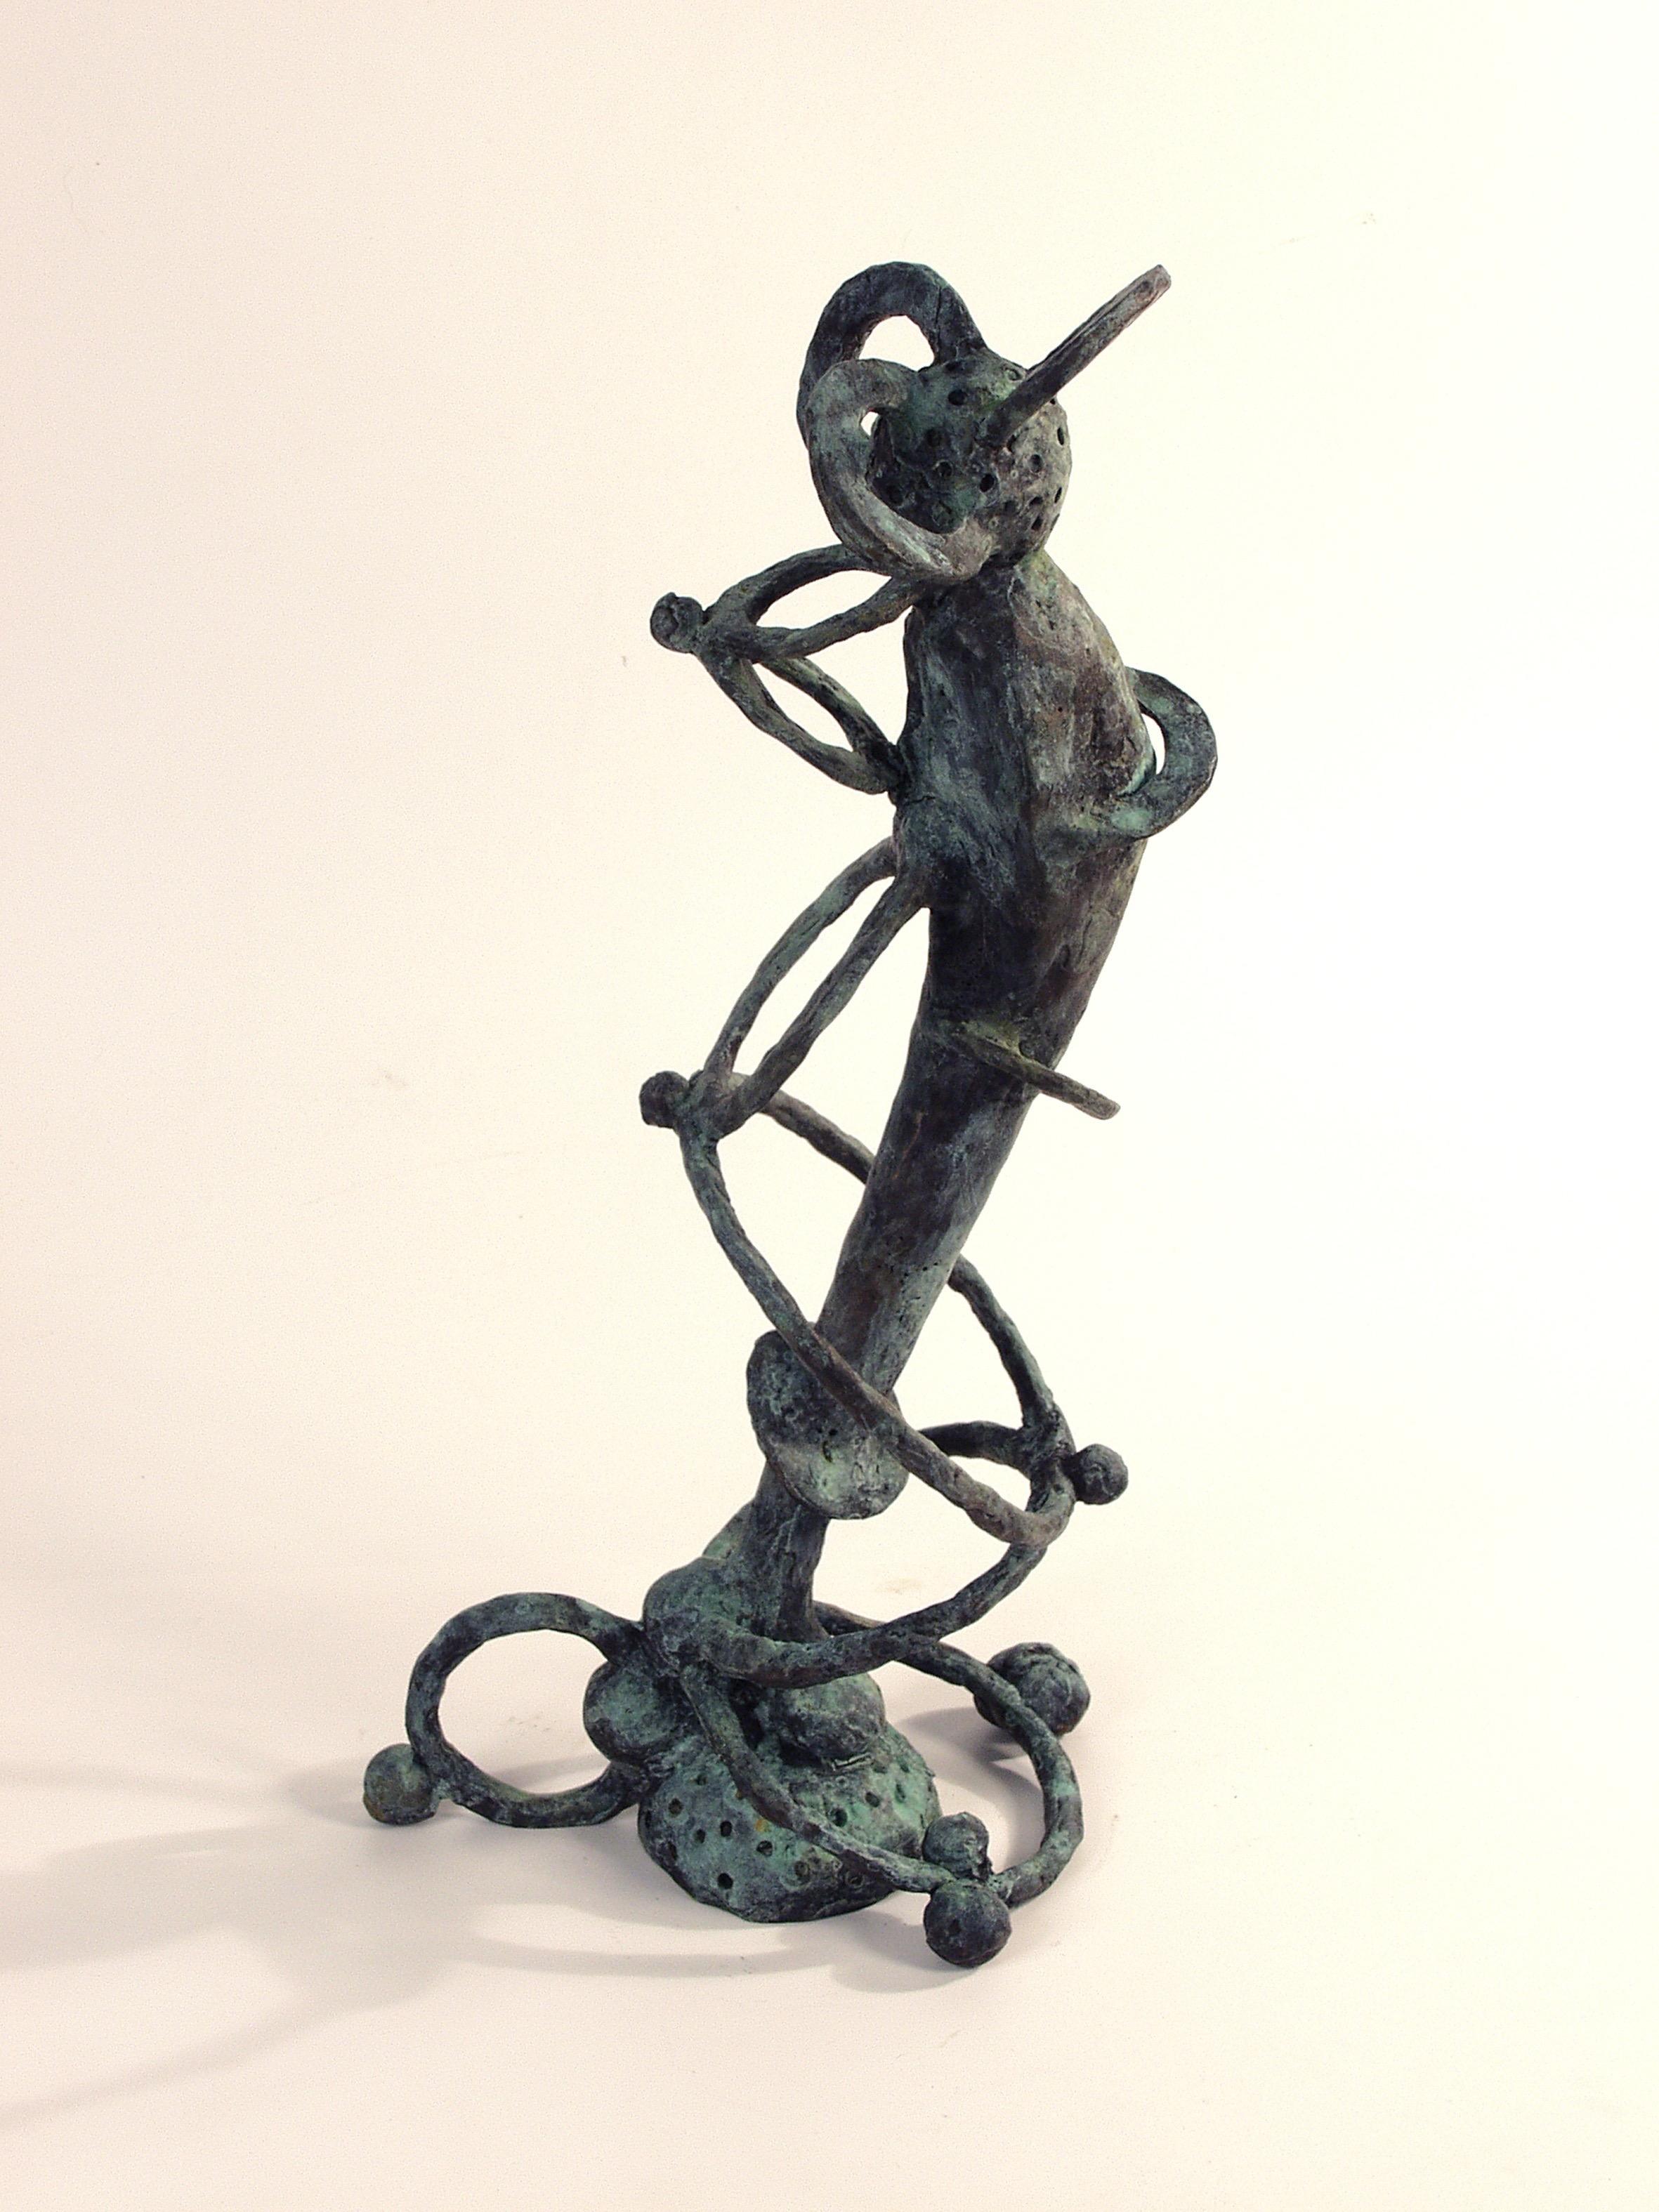 Dream Stalker, bronze (edition of 3), 50 X 17.5 X 22 cm, 2002